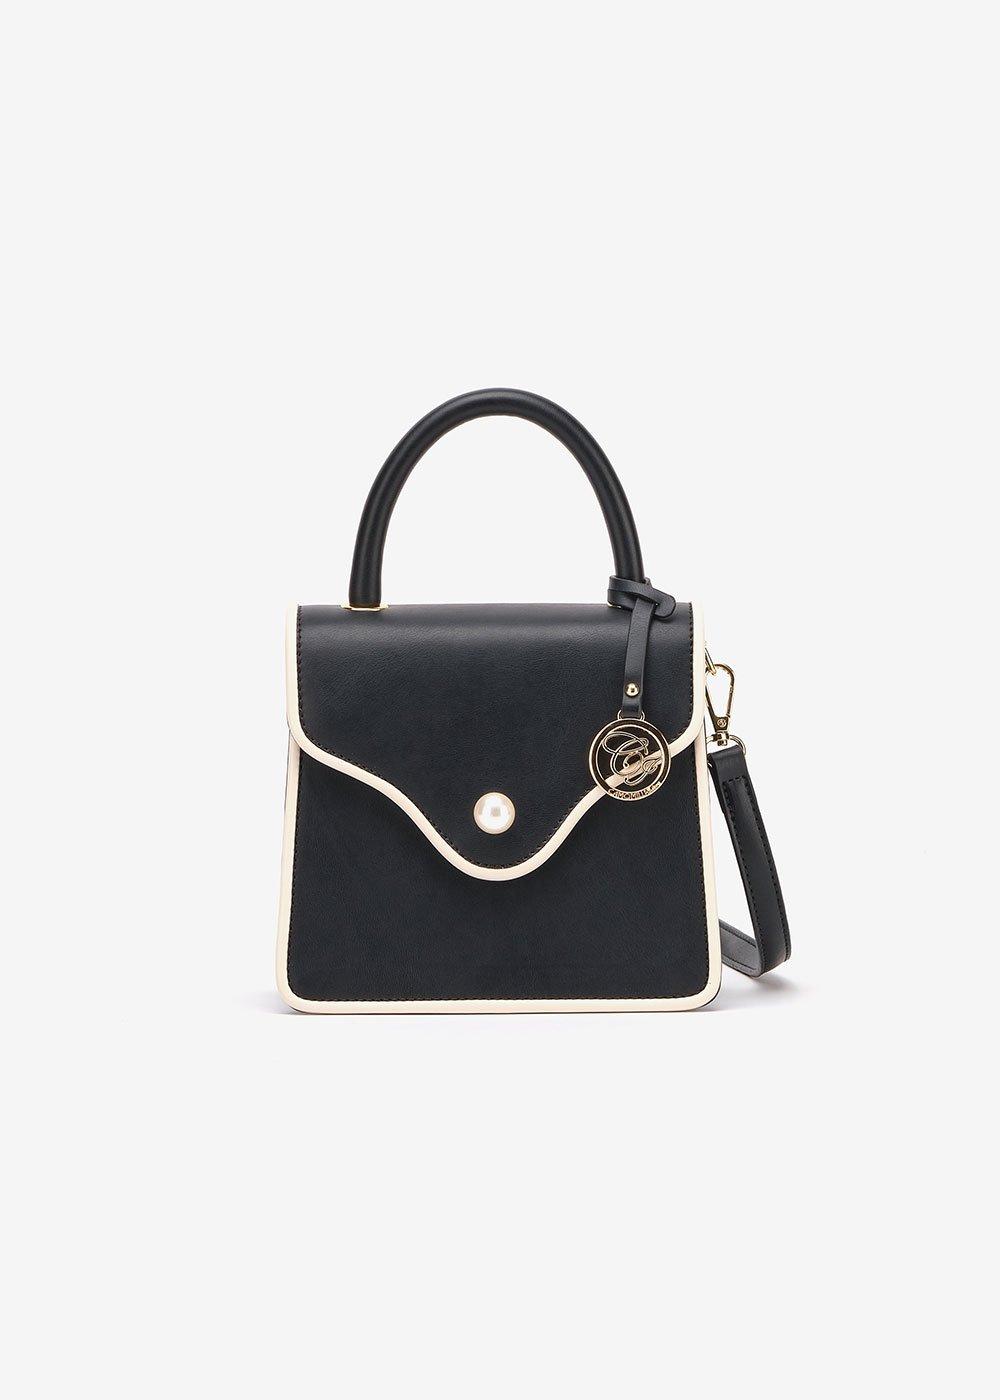 Brandy clutch bag with shoulder strap - Black-Beige - Woman